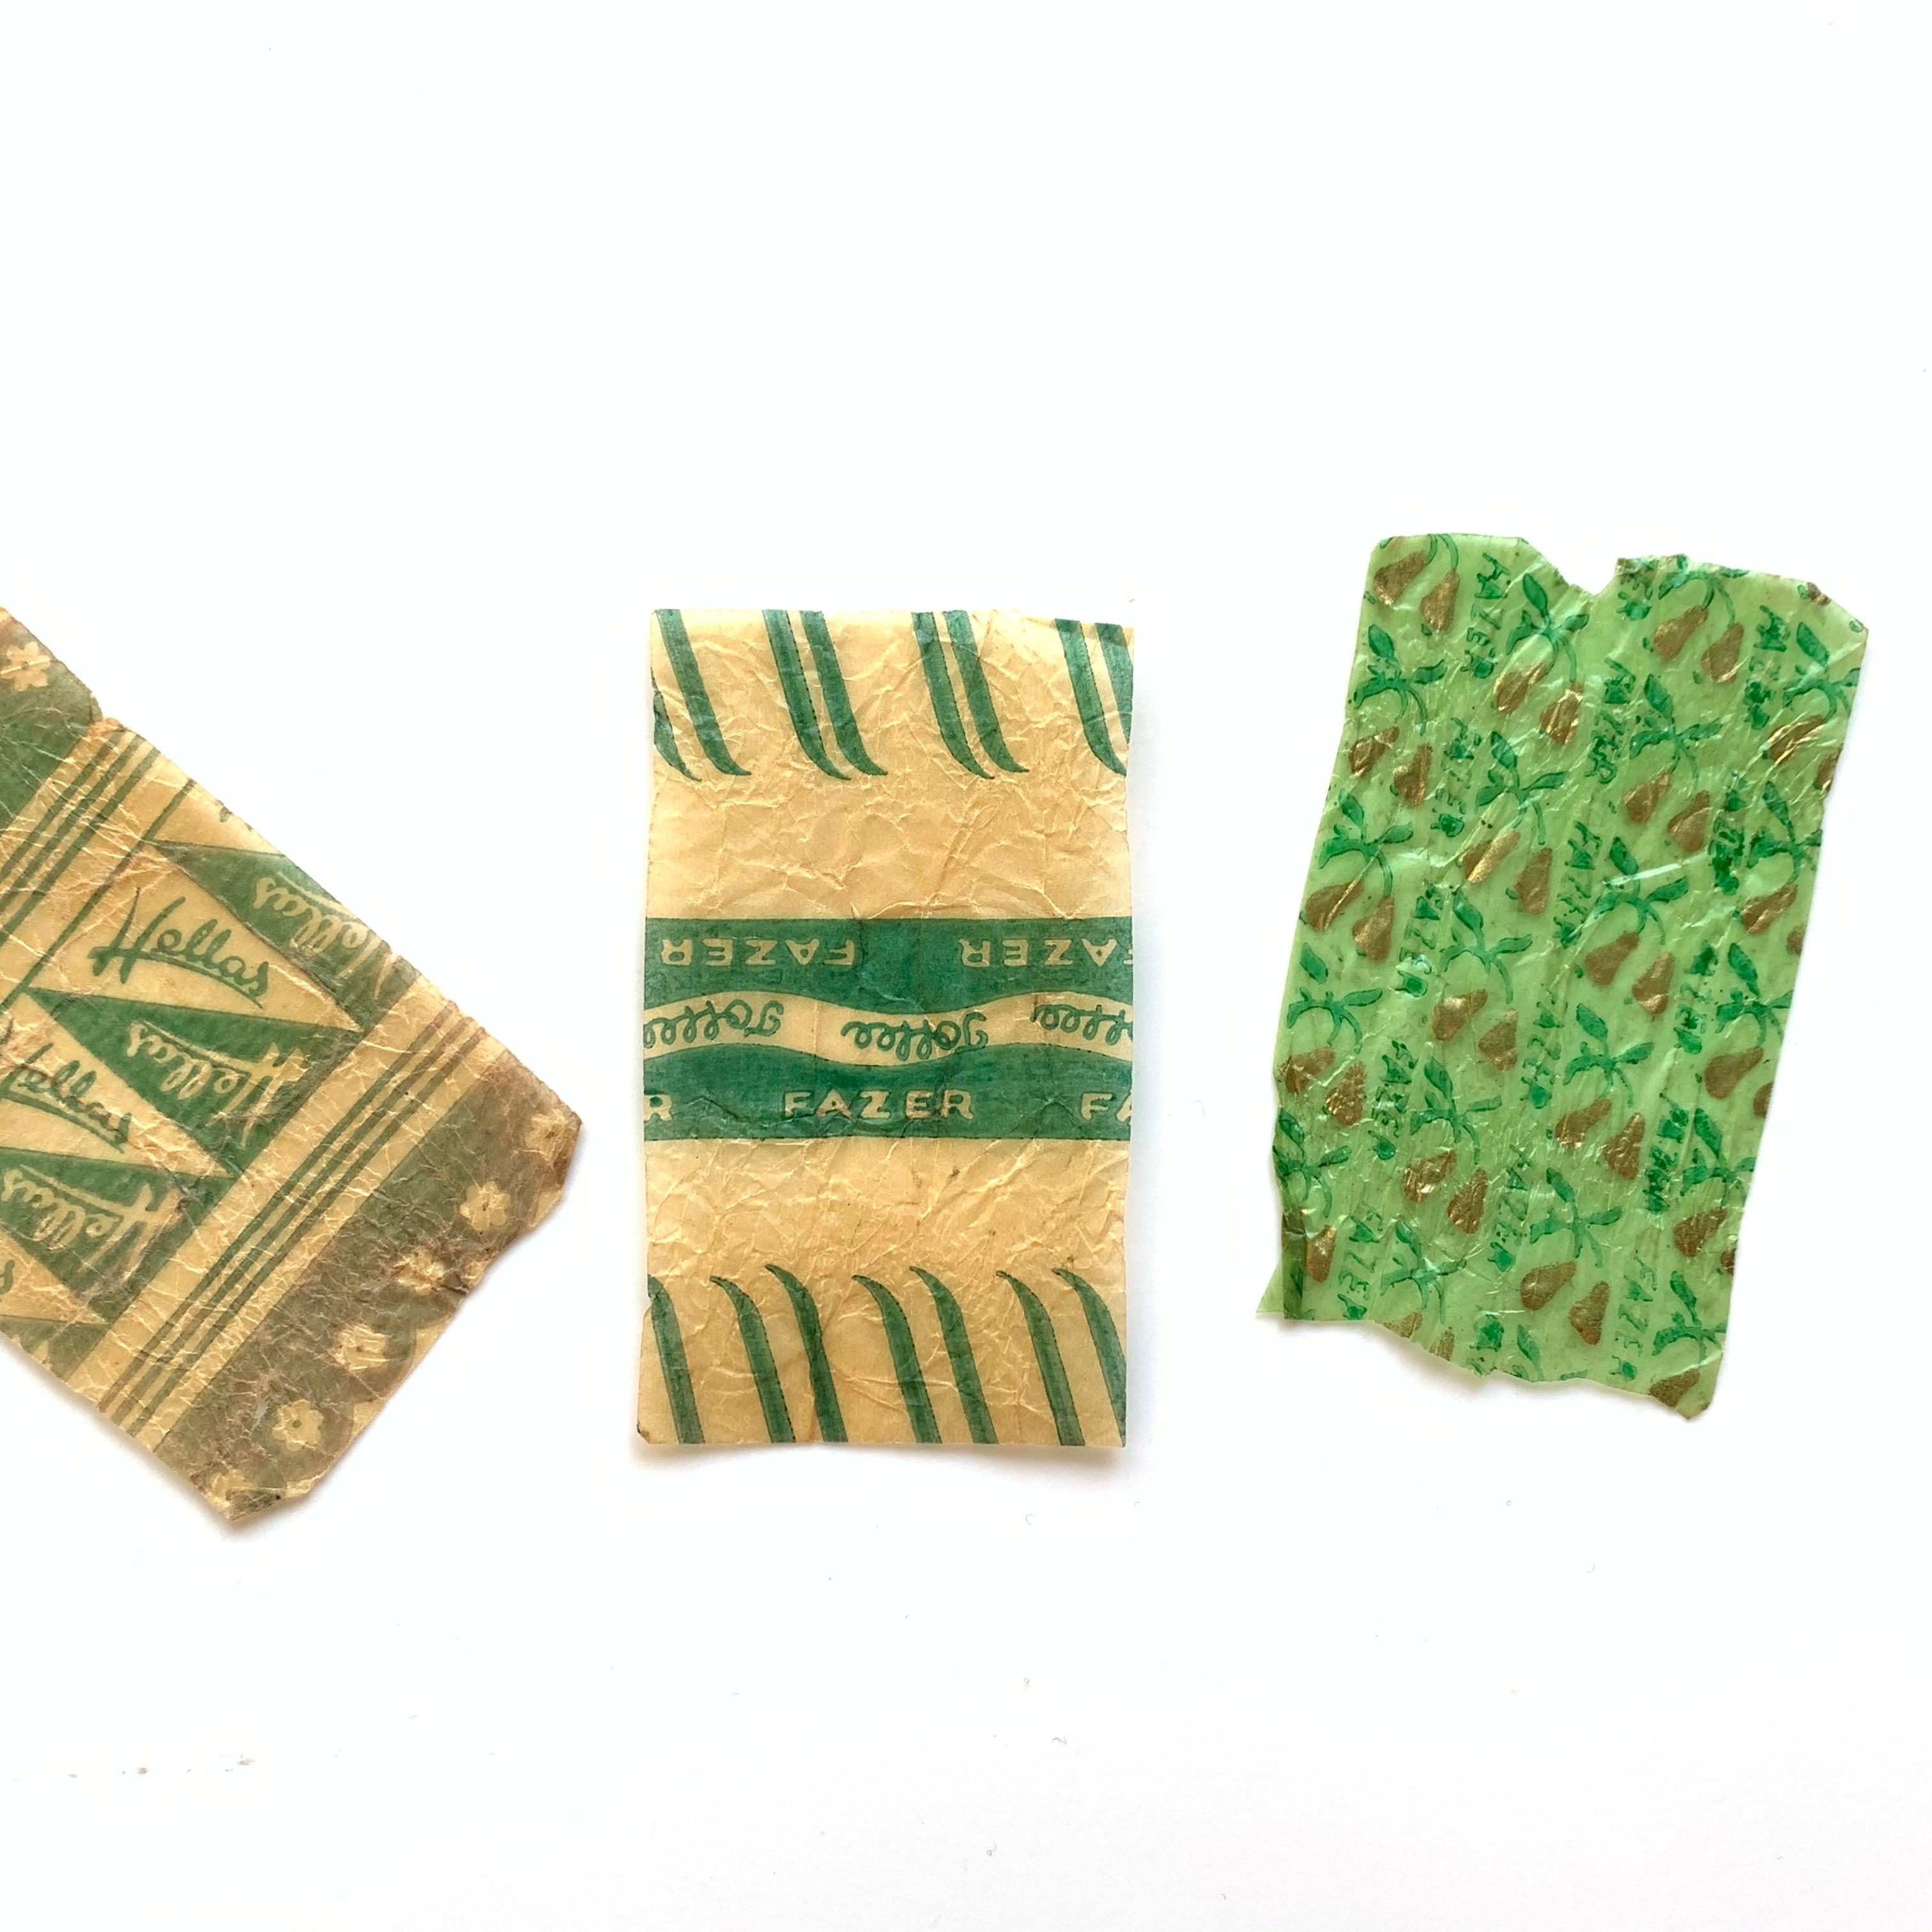 FAZER / vintage candy wrapper[B]